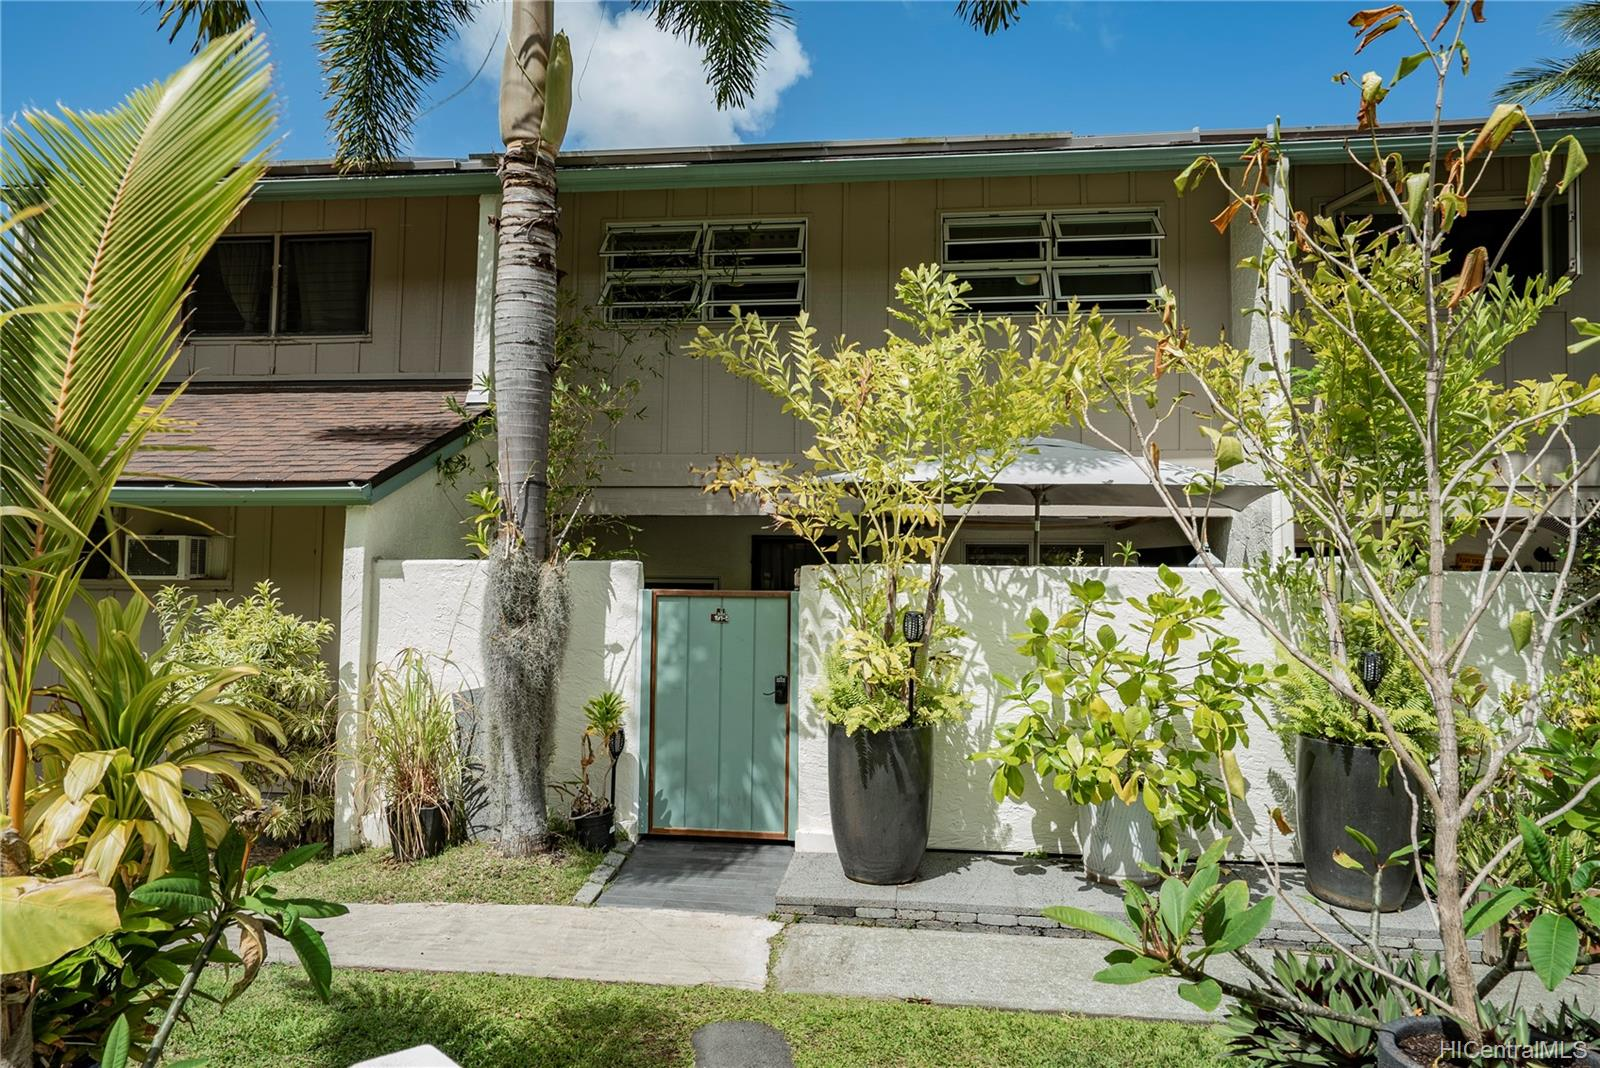 191-5 Oko Street townhouse # 2505, Kailua, Hawaii - photo 16 of 25